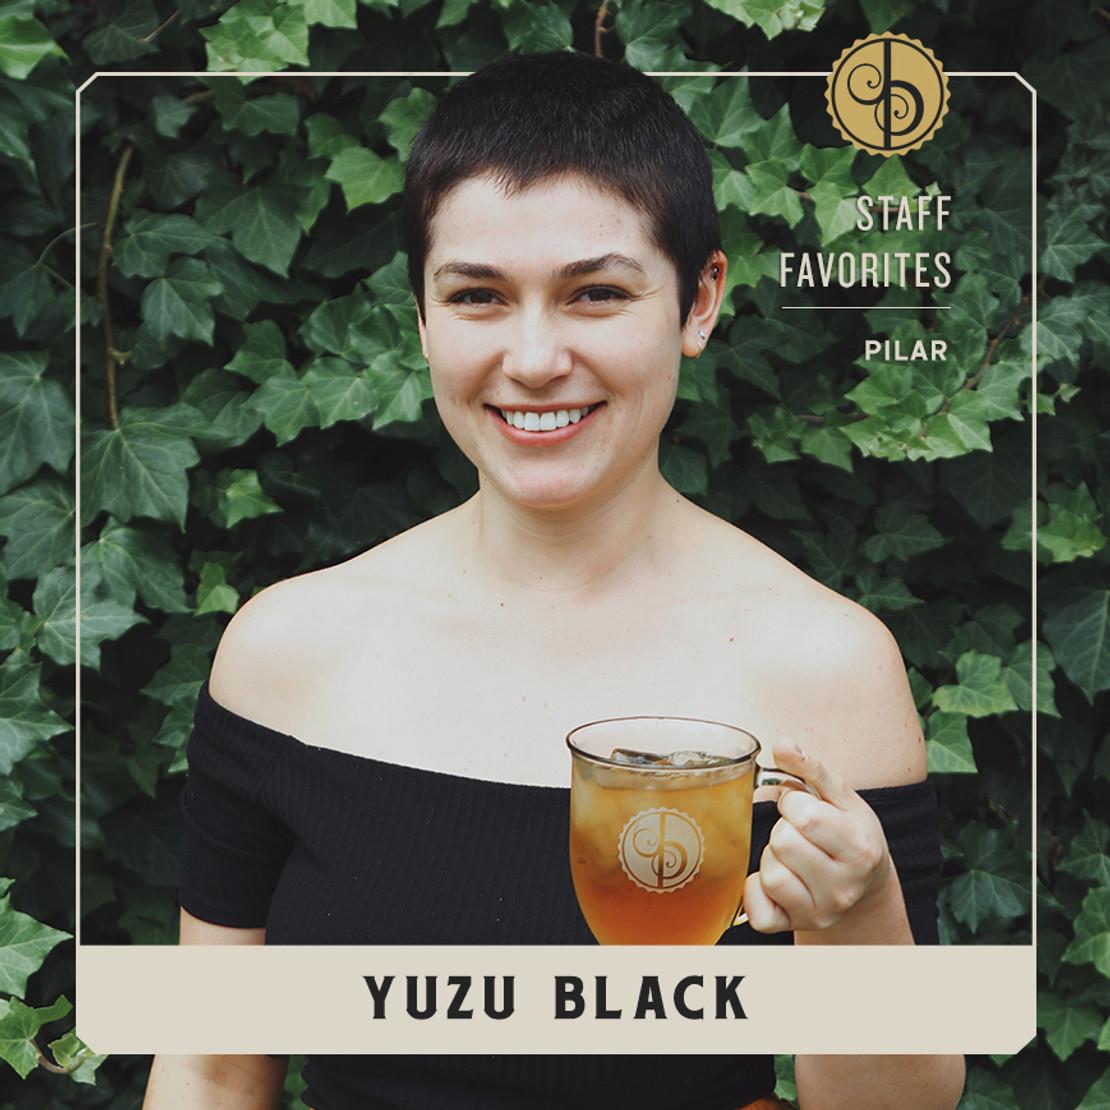 Staff Favorites: Pilar & Yuzu Black